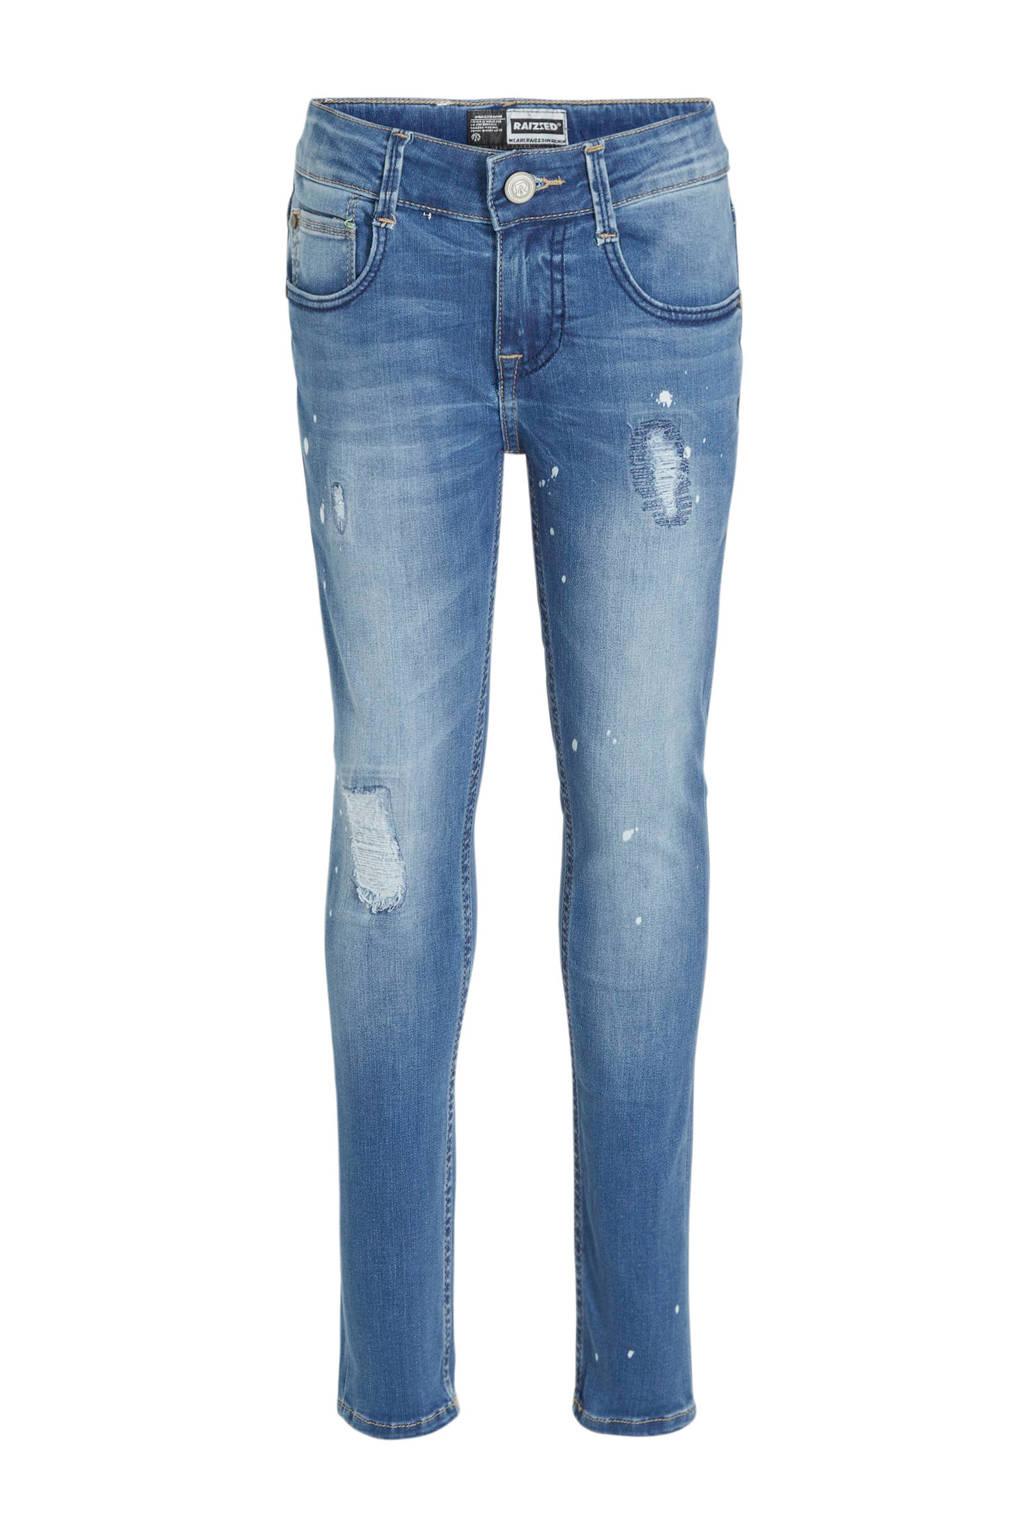 Raizzed skinny jeans Tokyo Crafted stonewashed, Stonewashed